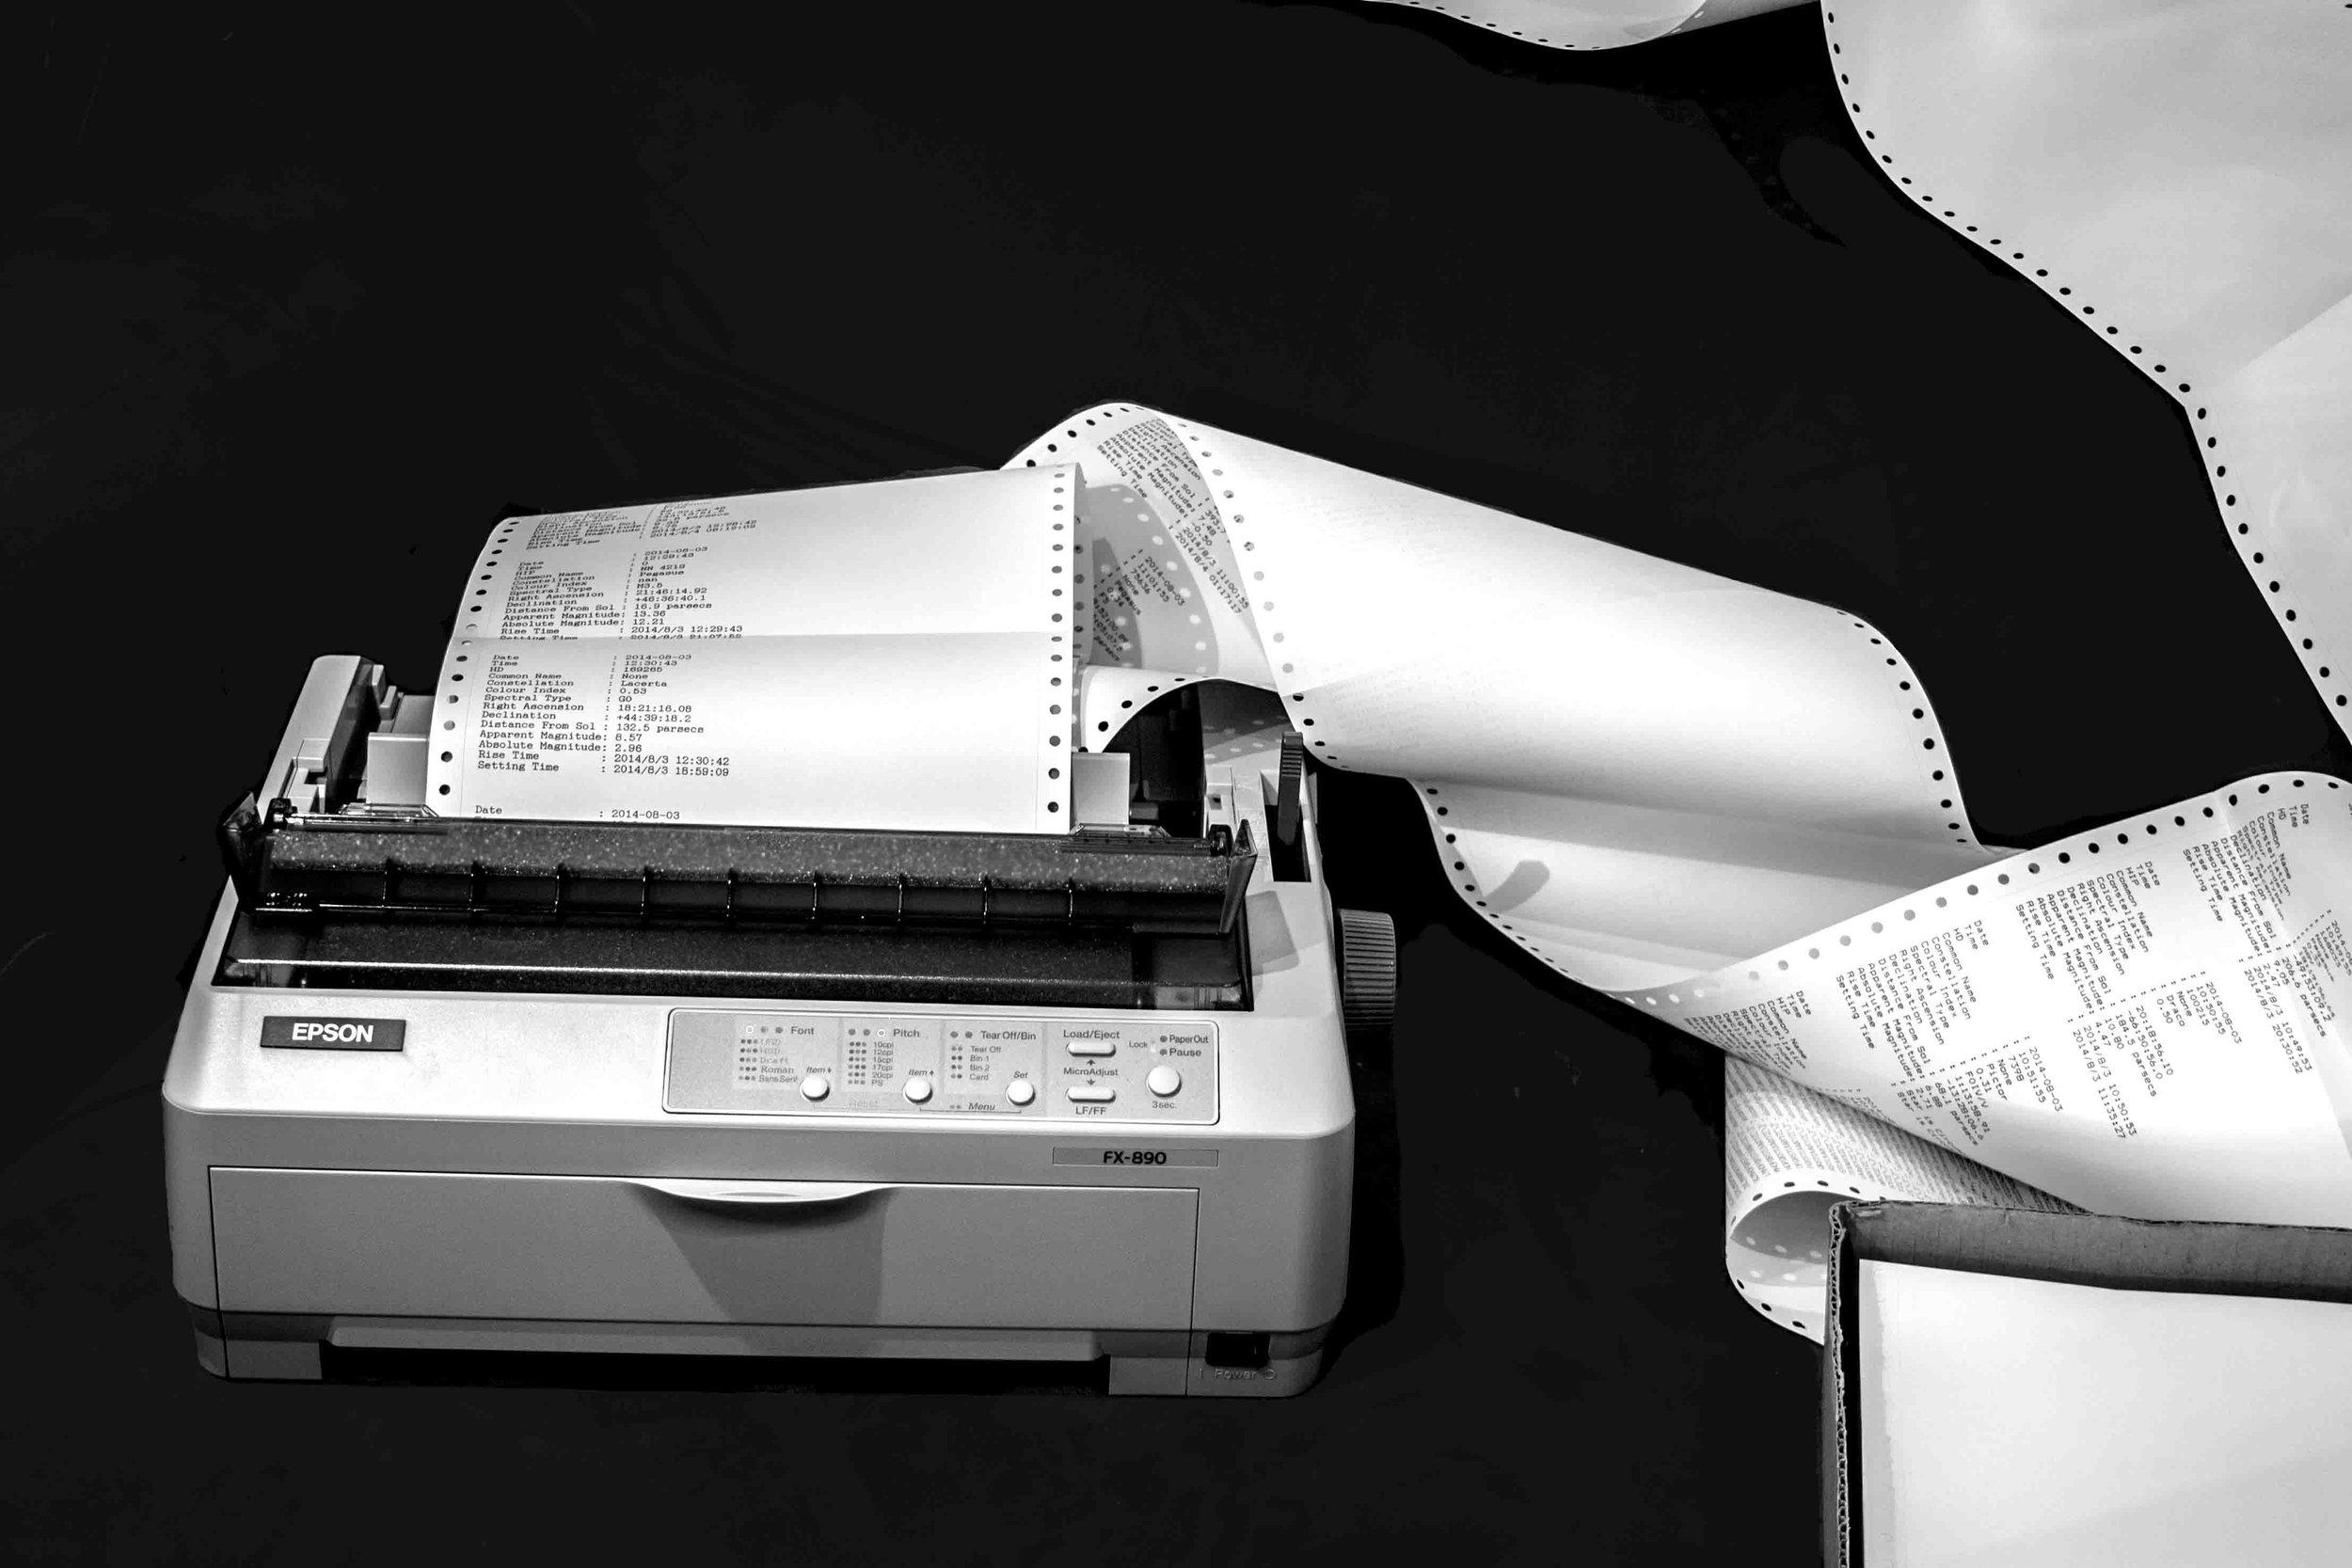 Michaela Gleave, The World Arrives at Night (Star Printer) , 2014, dot matrix printer, mini PC, custom computer program, fanfold paper, table, 107 x 120 x60cm, programming: Michaela T Fitzgerald